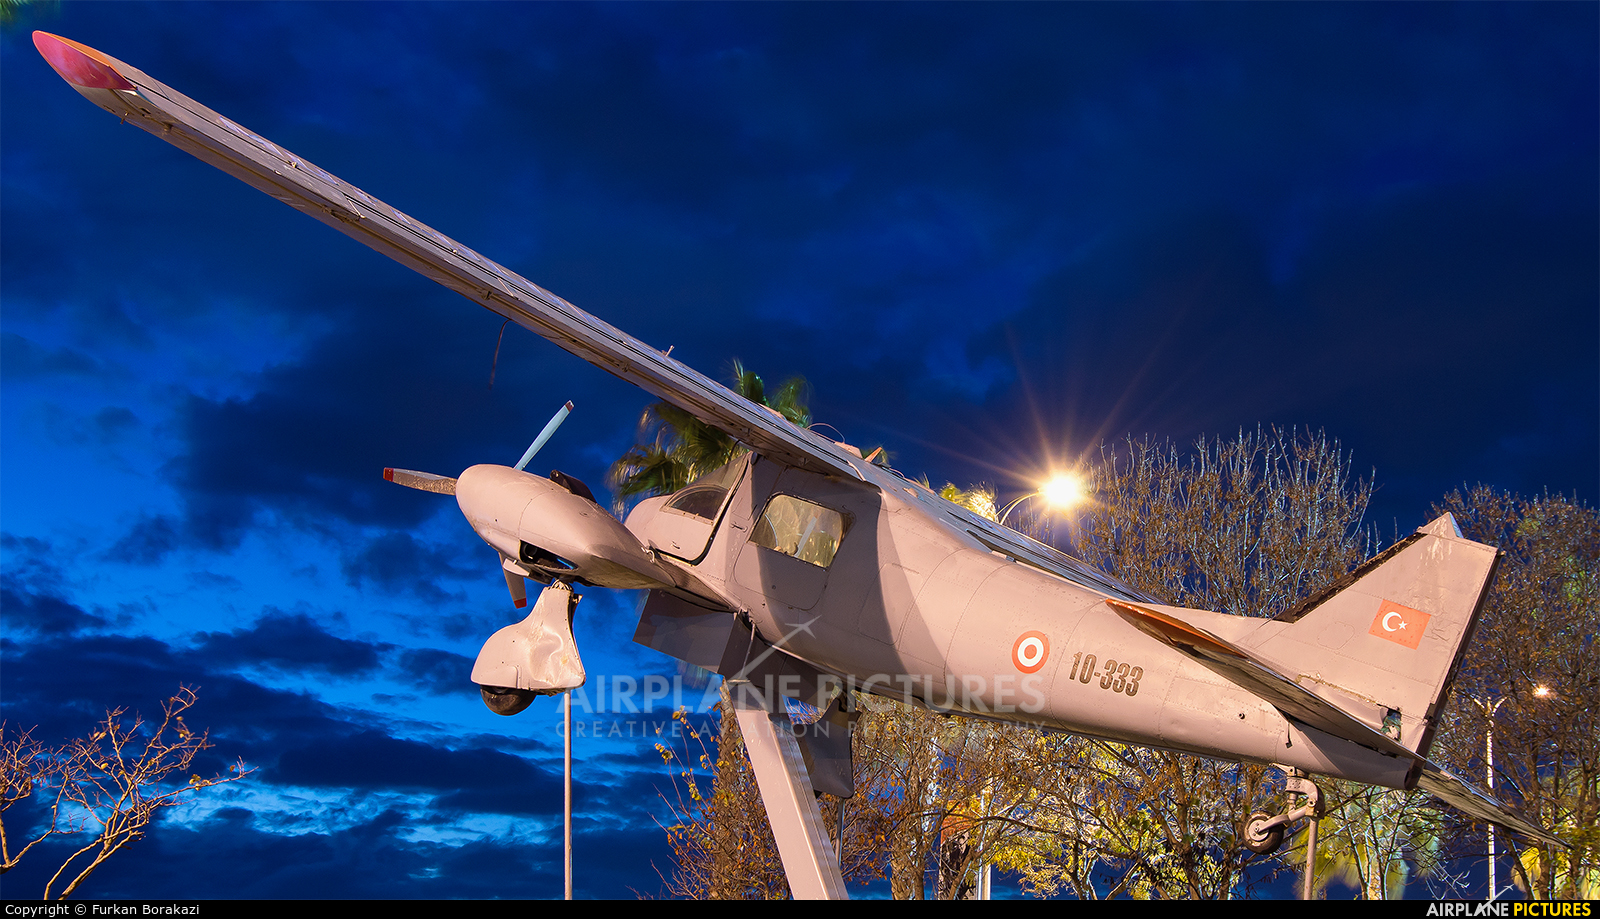 Turkey - Air Force 10-333 aircraft at Off Airport - Turkey